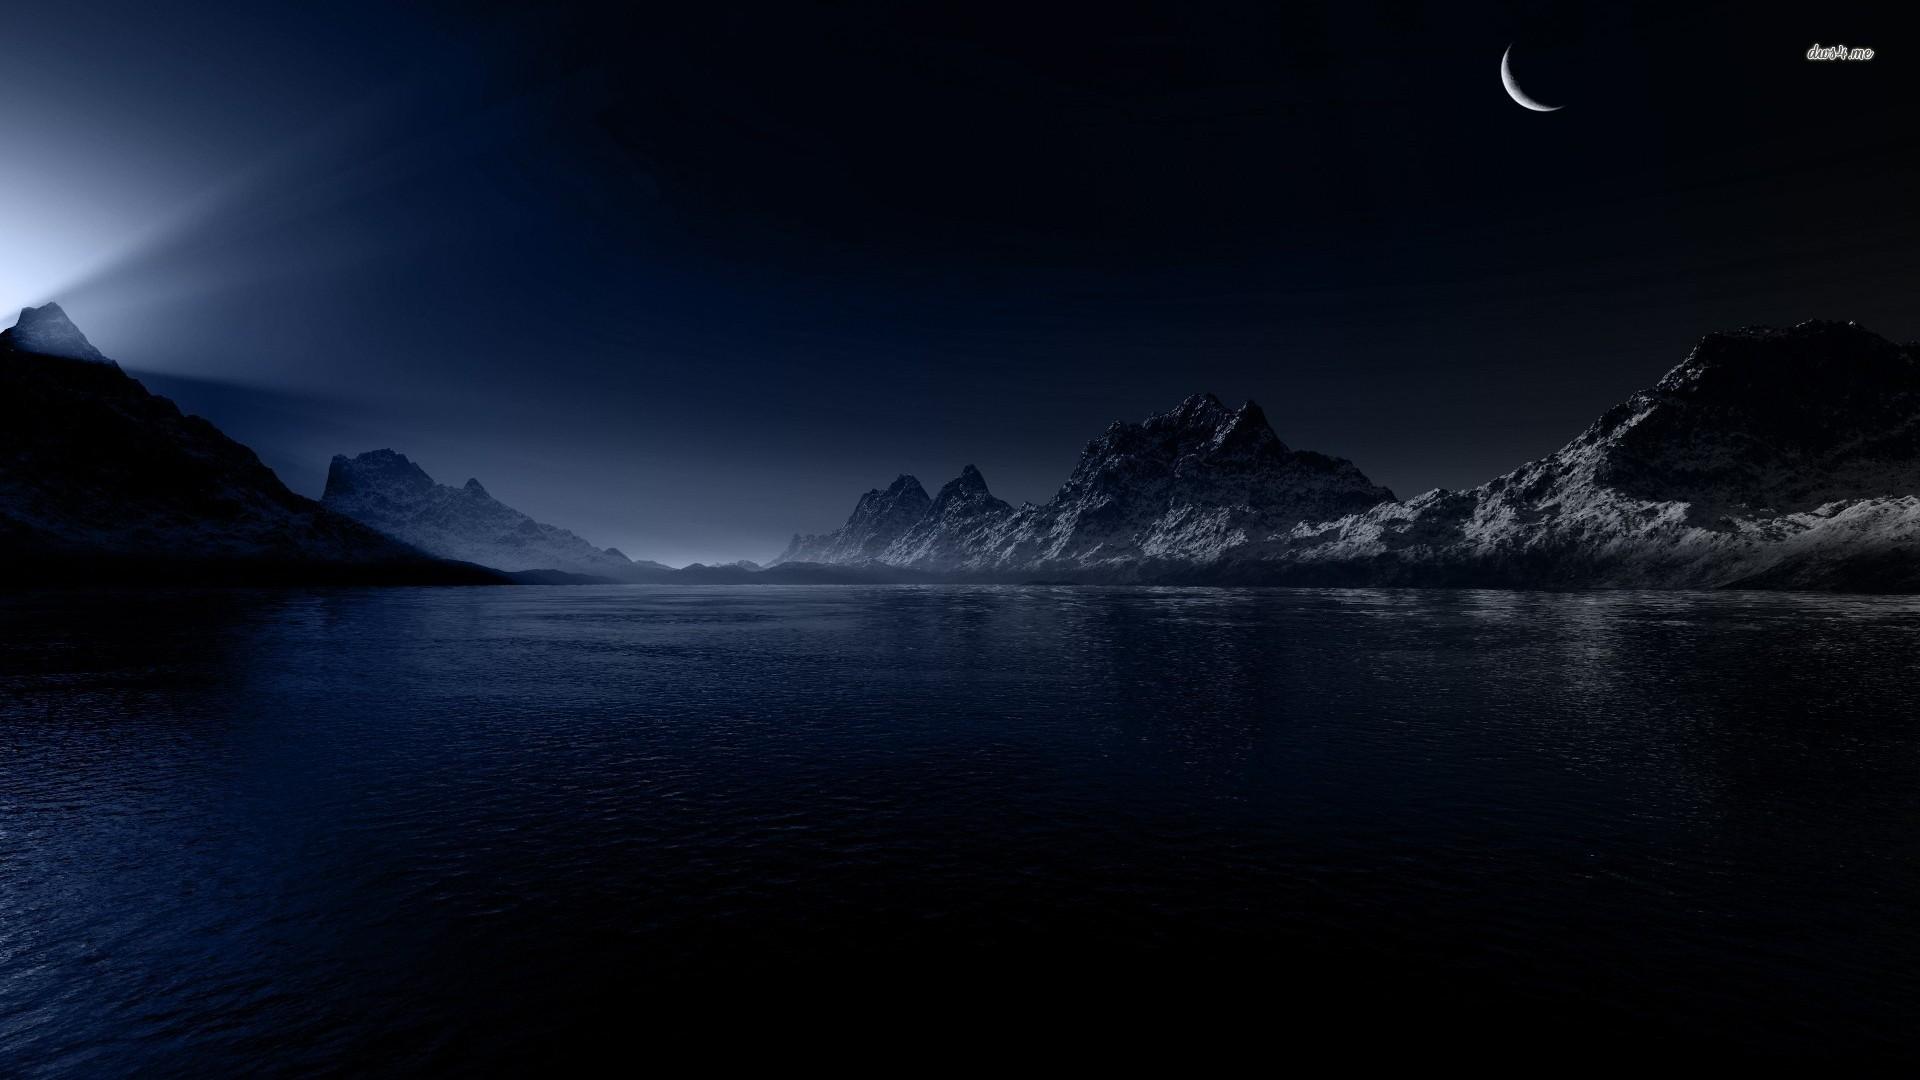 Dark Mountain HD Download